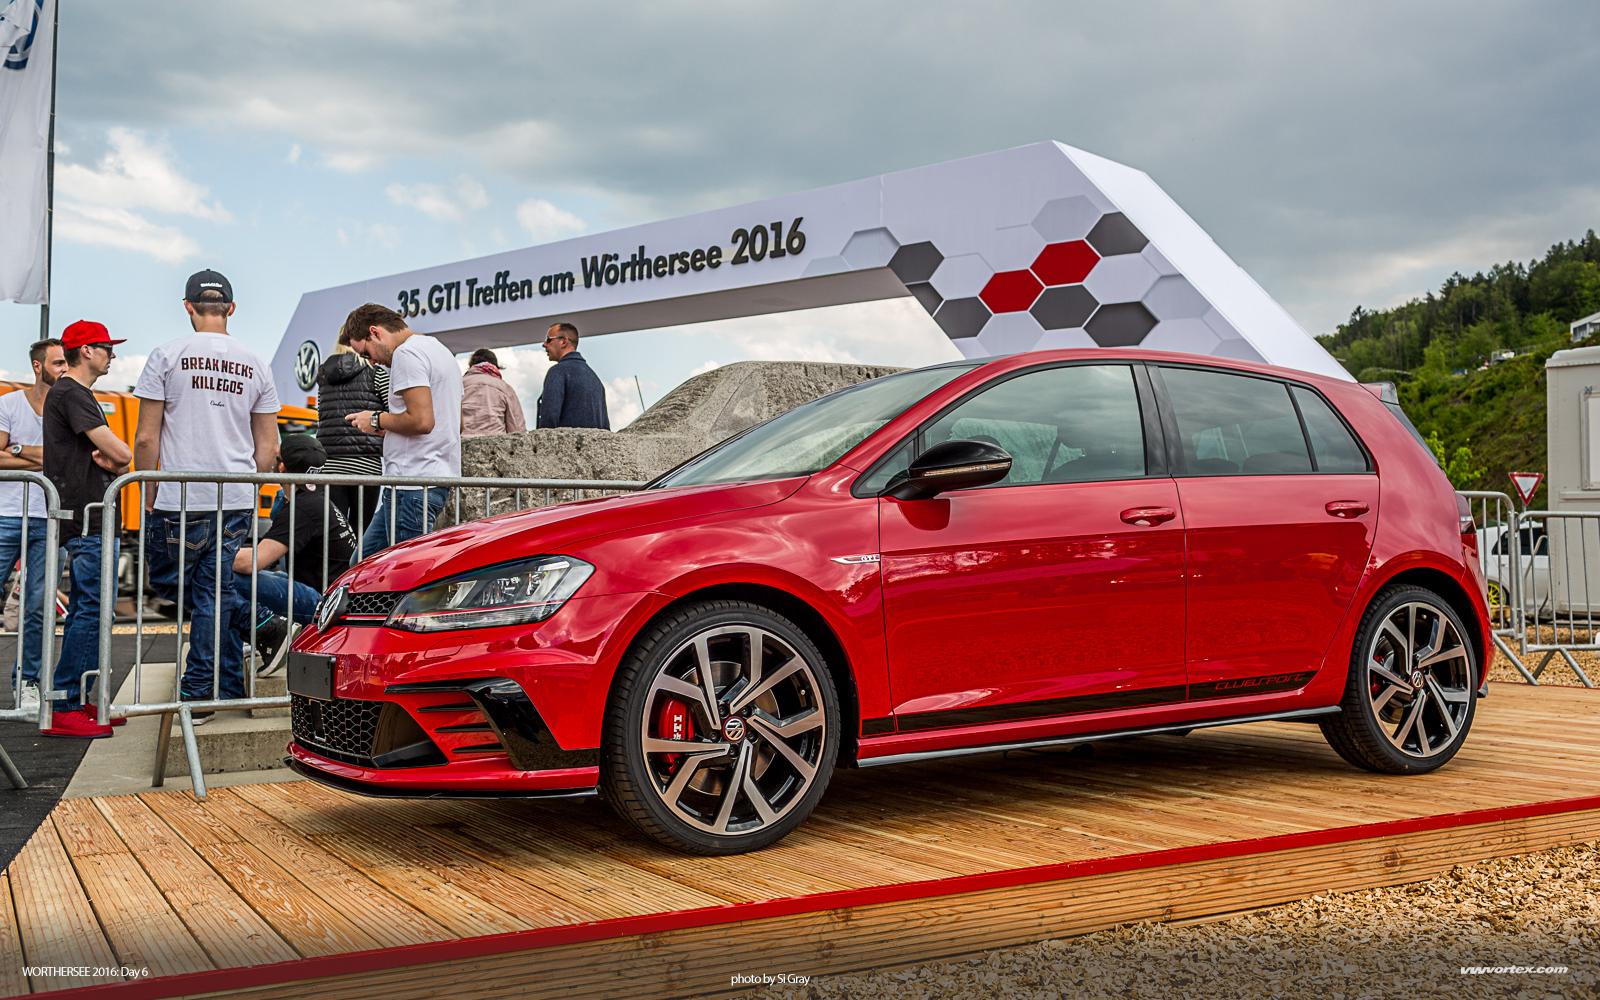 Audi R8 Test Mule spoiler 715 110x60 photo